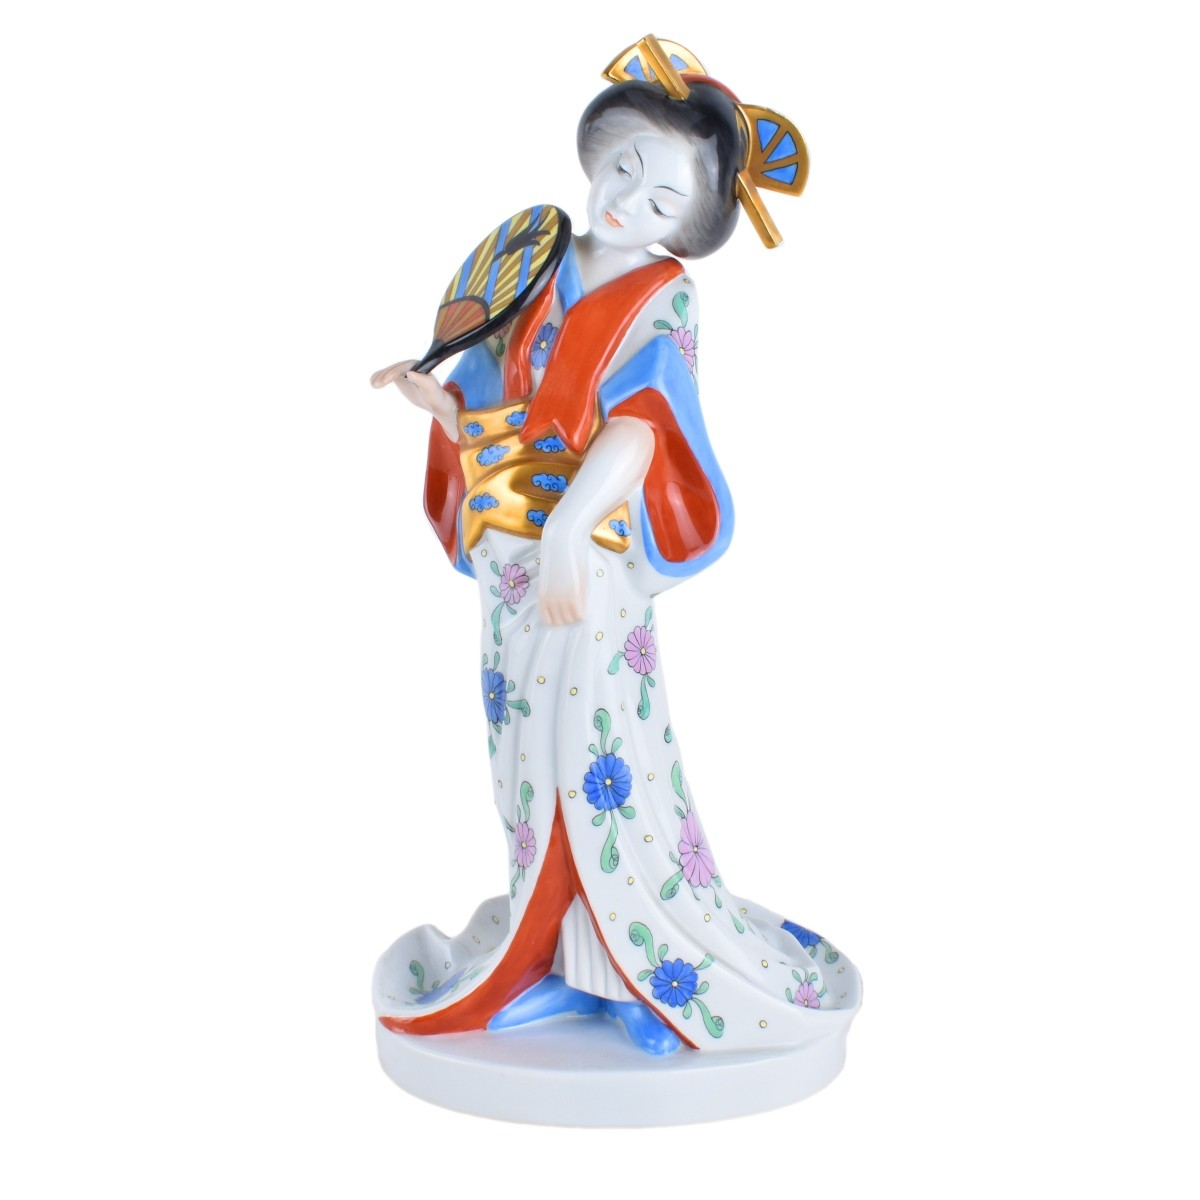 Lot 192 - Herend Porcelain Geisha Figurine